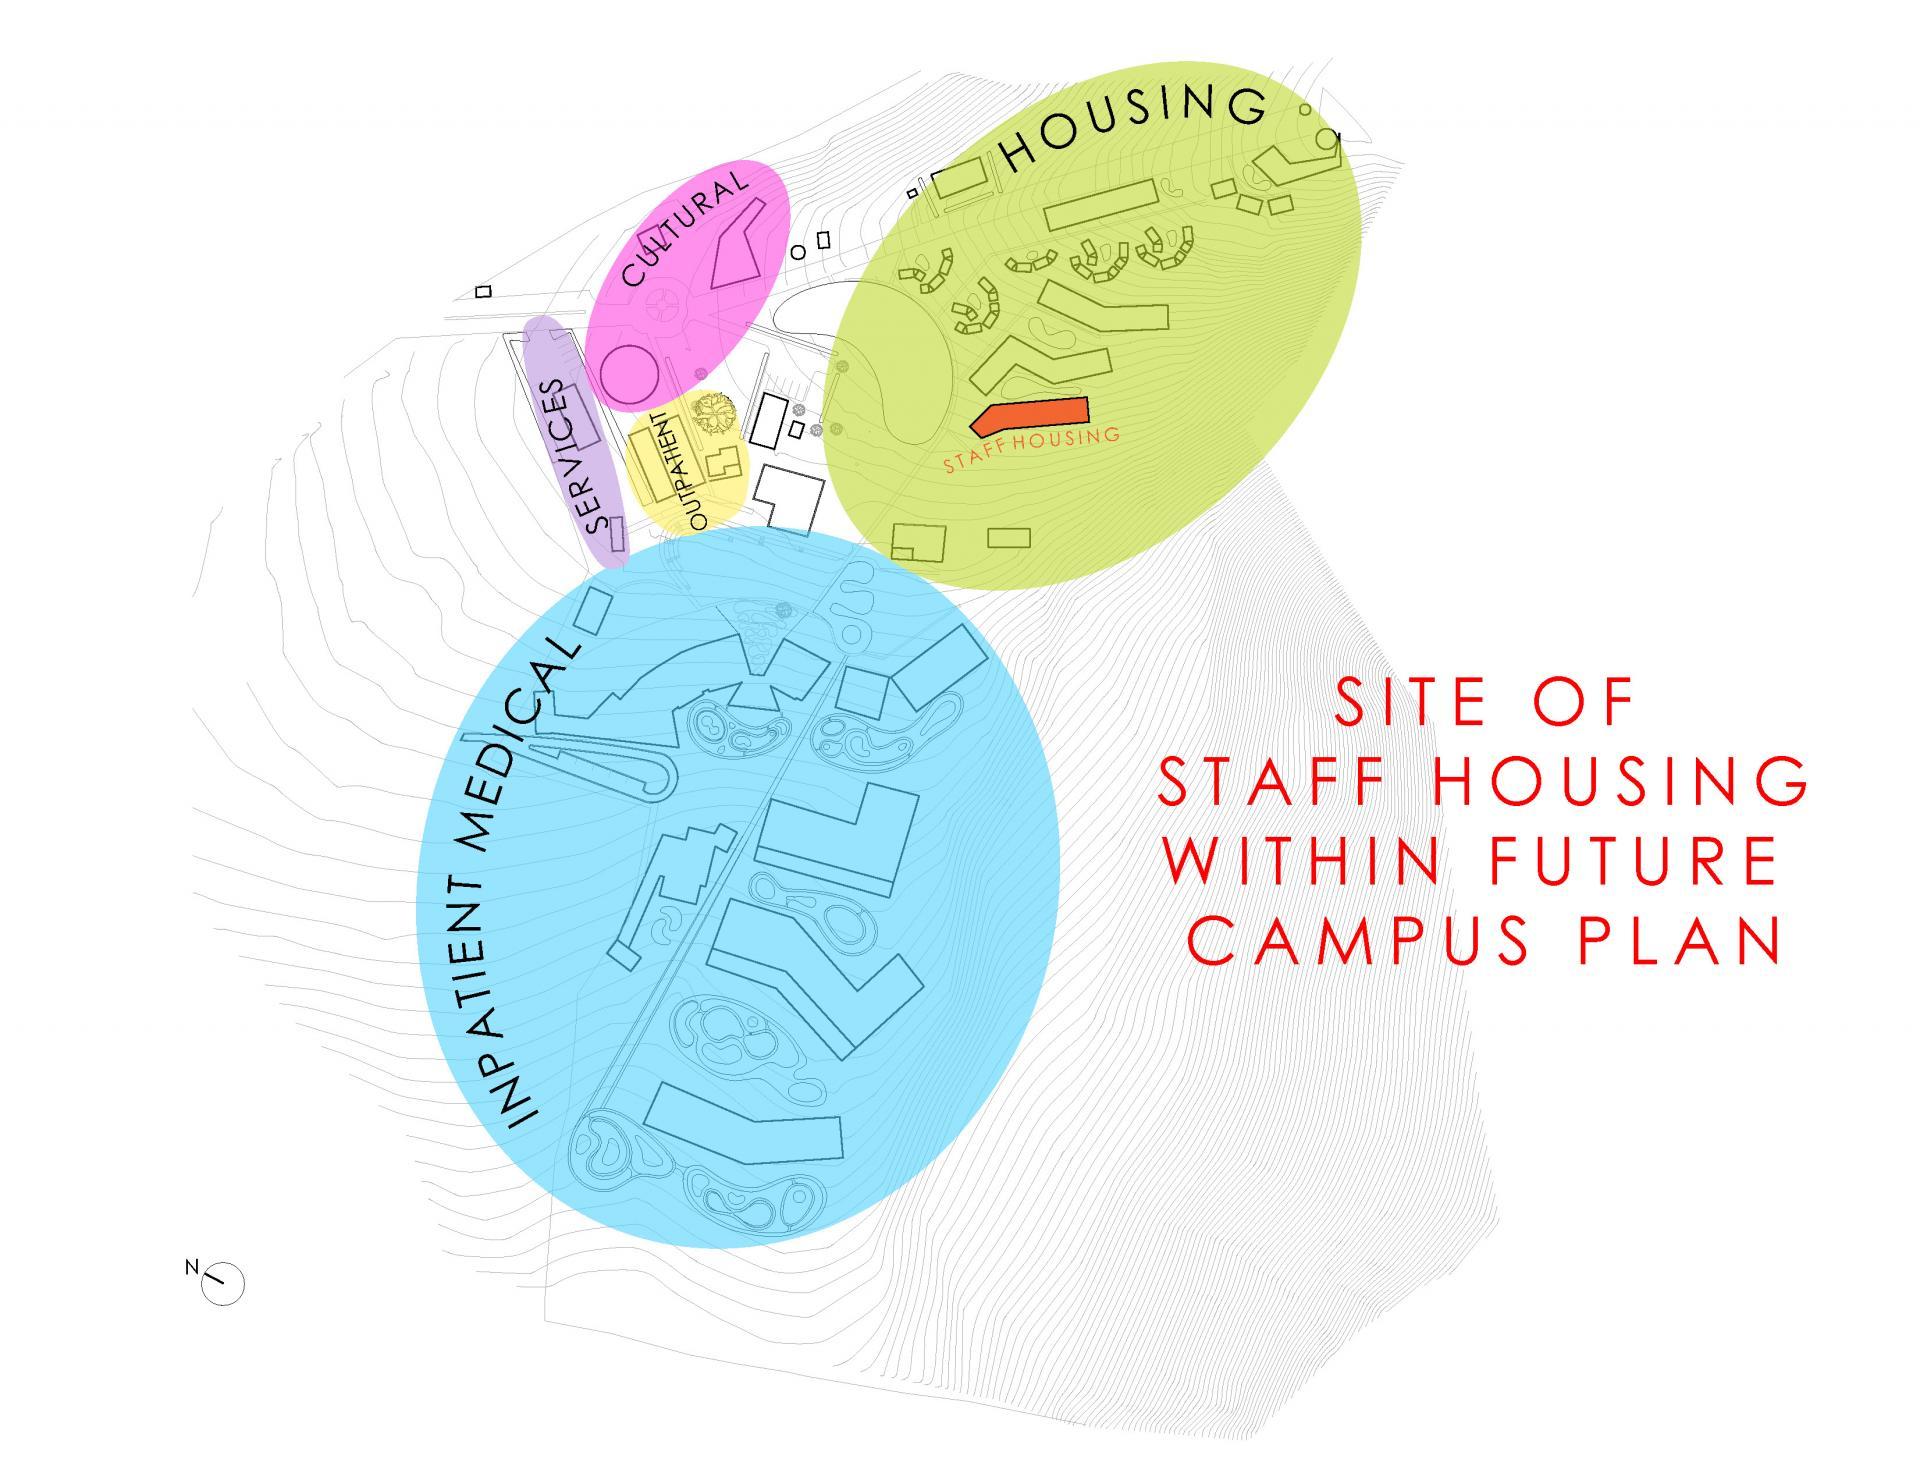 VHW_Staff_Housing4Master_Plan_0